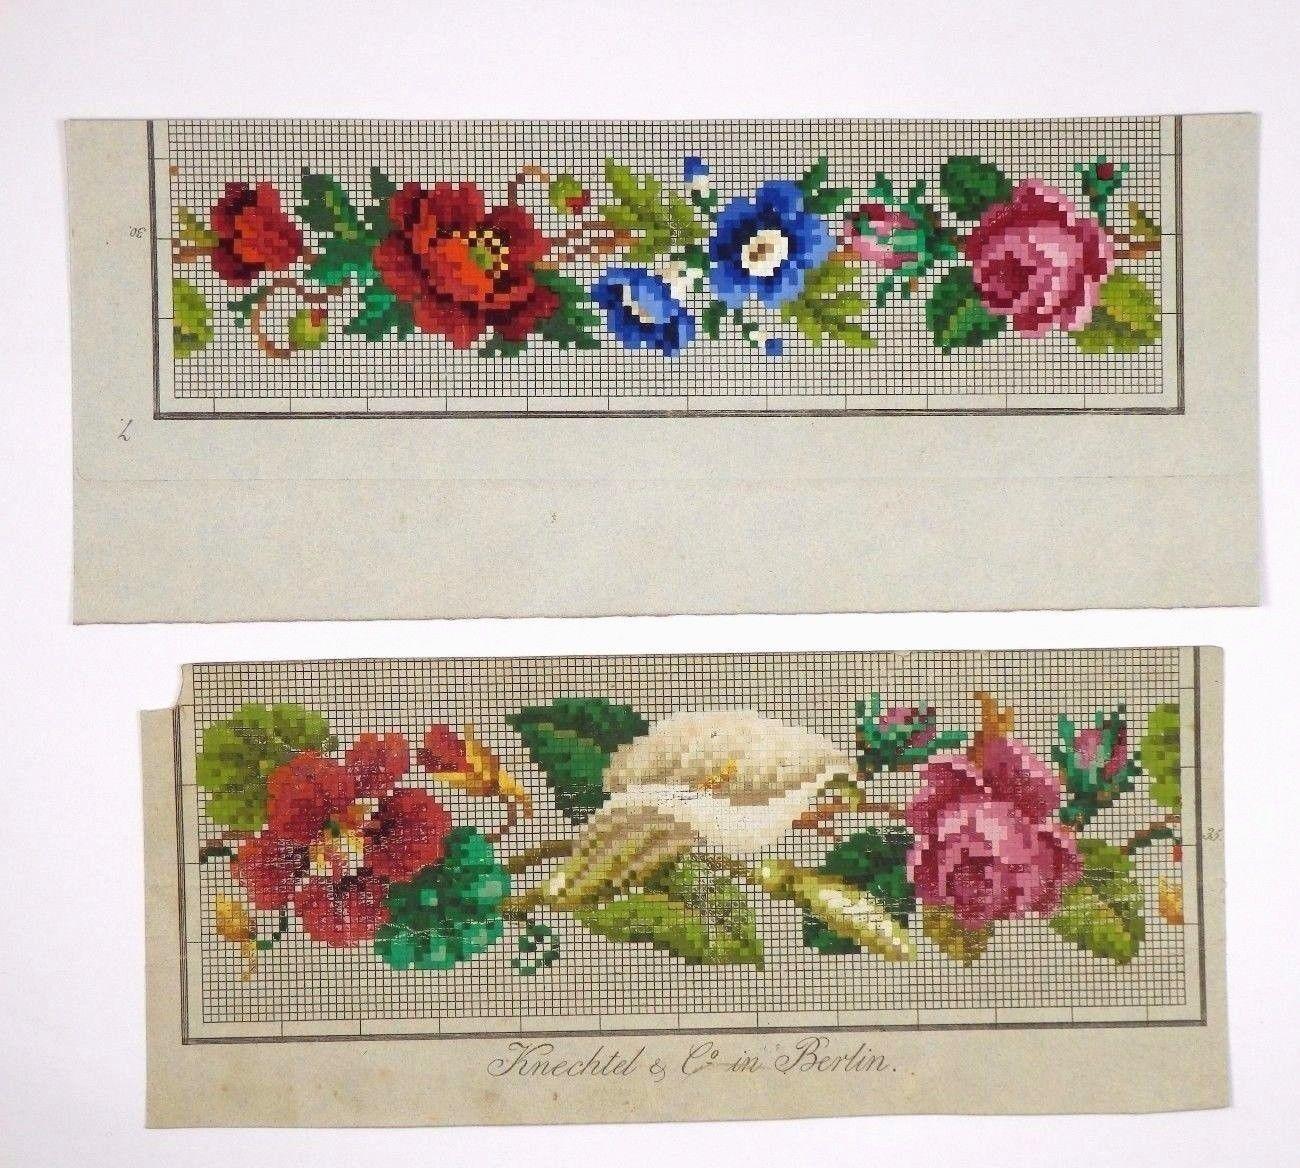 Antique berlin woolwork hand painted chart 19th cent - Farbkarten kostenlos ...